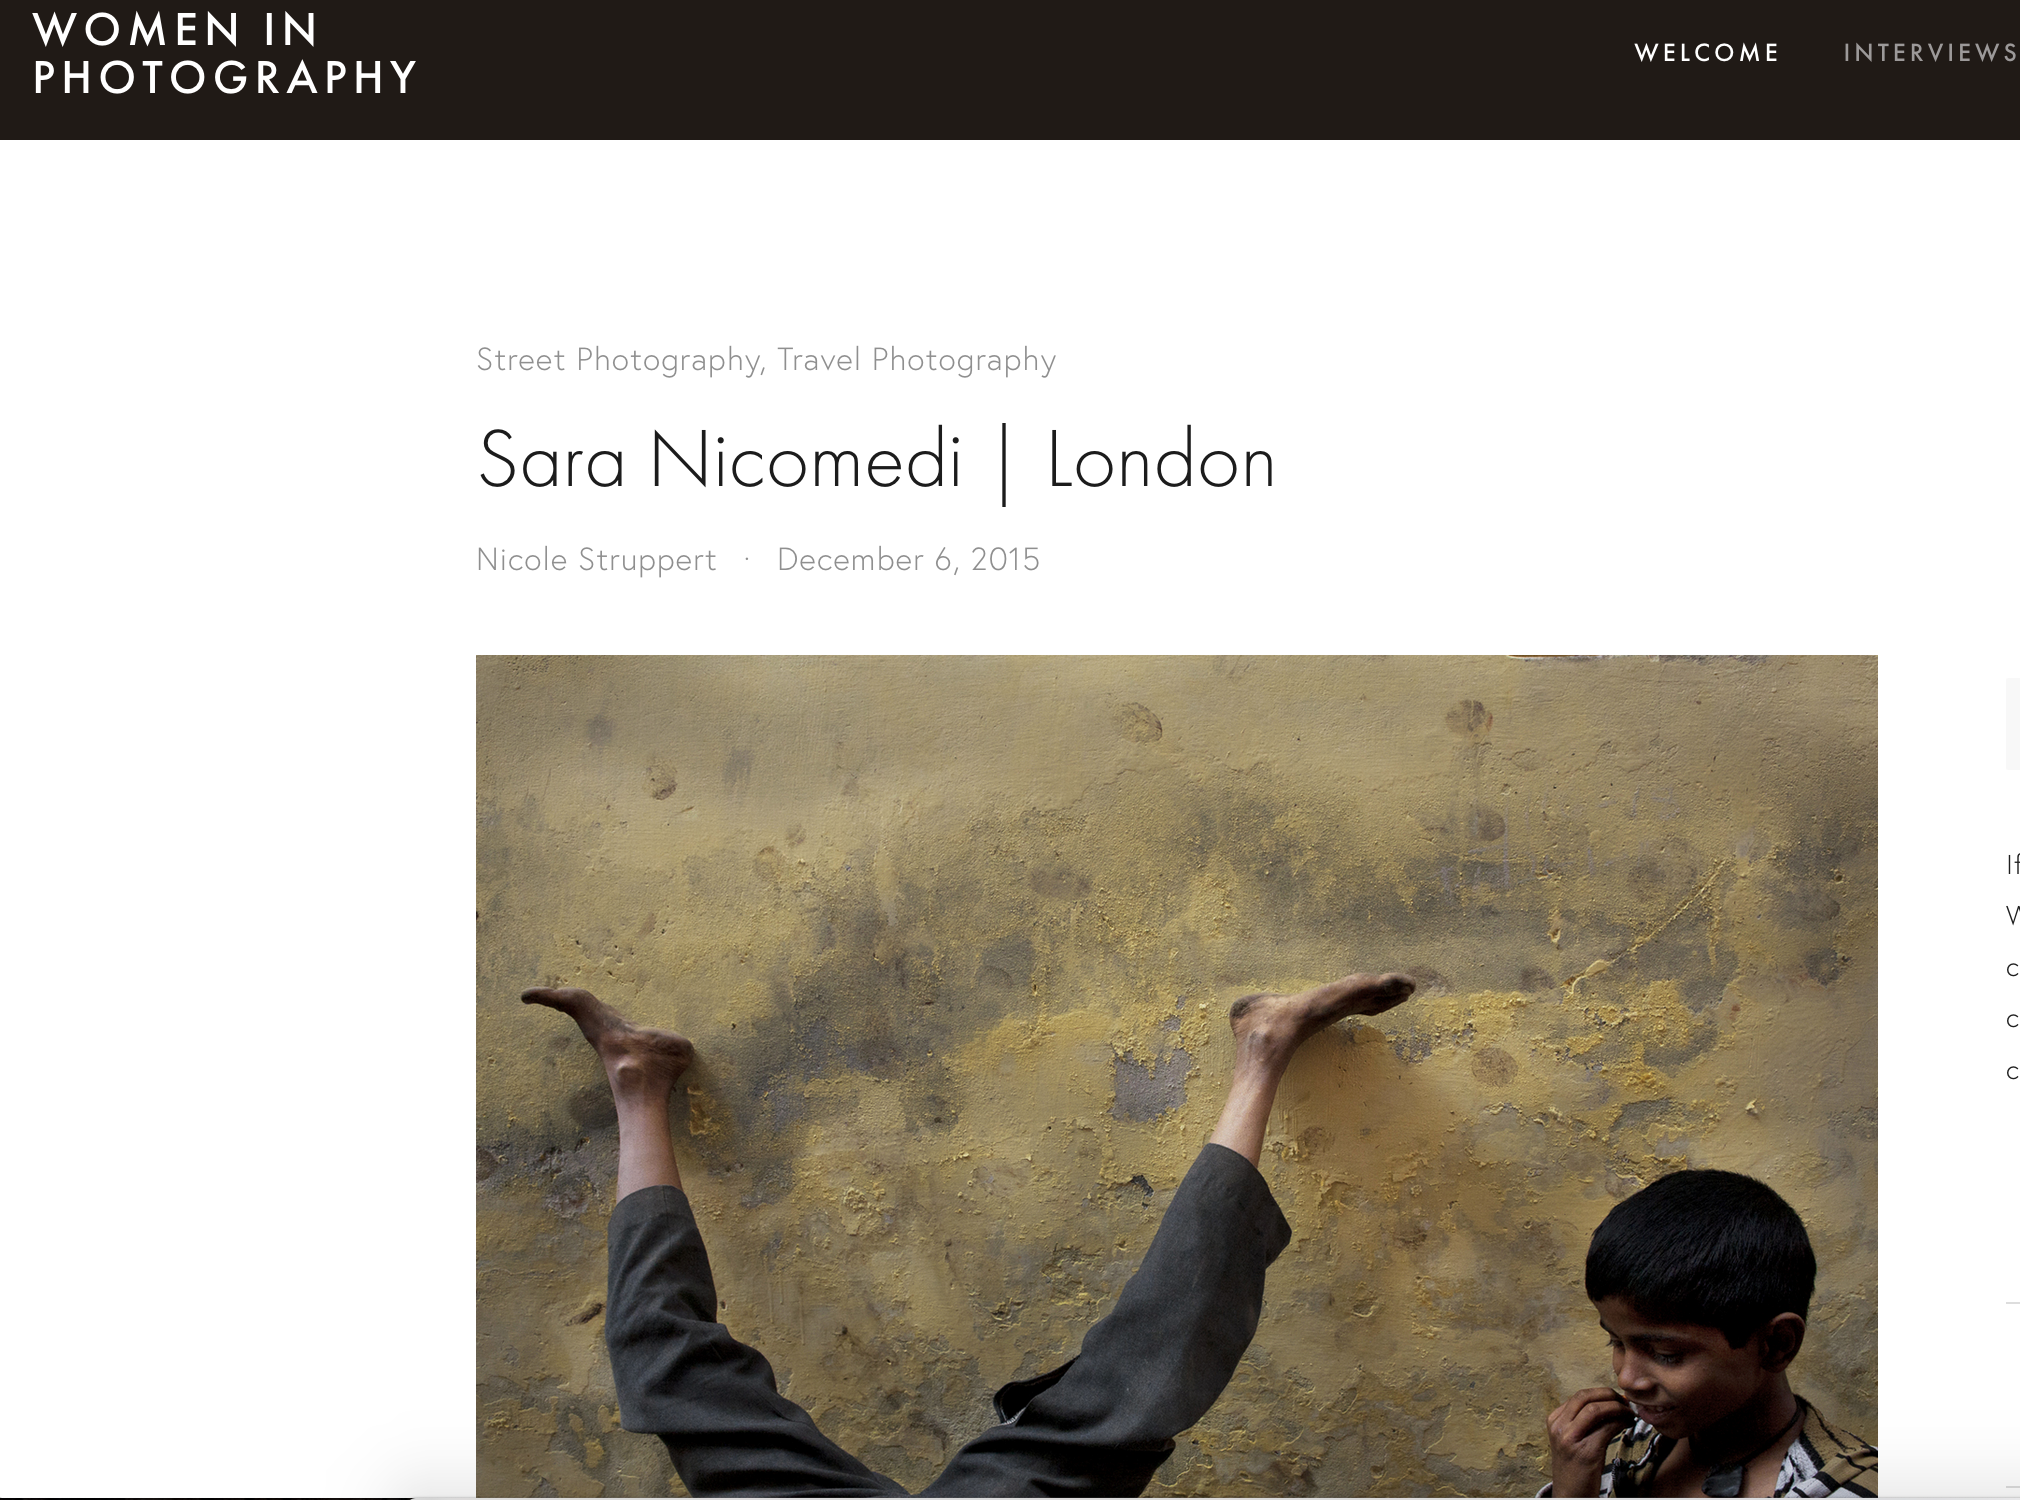 https://www.womeninphotography.info/blog/2015/12/6/sara-nicomedi-london